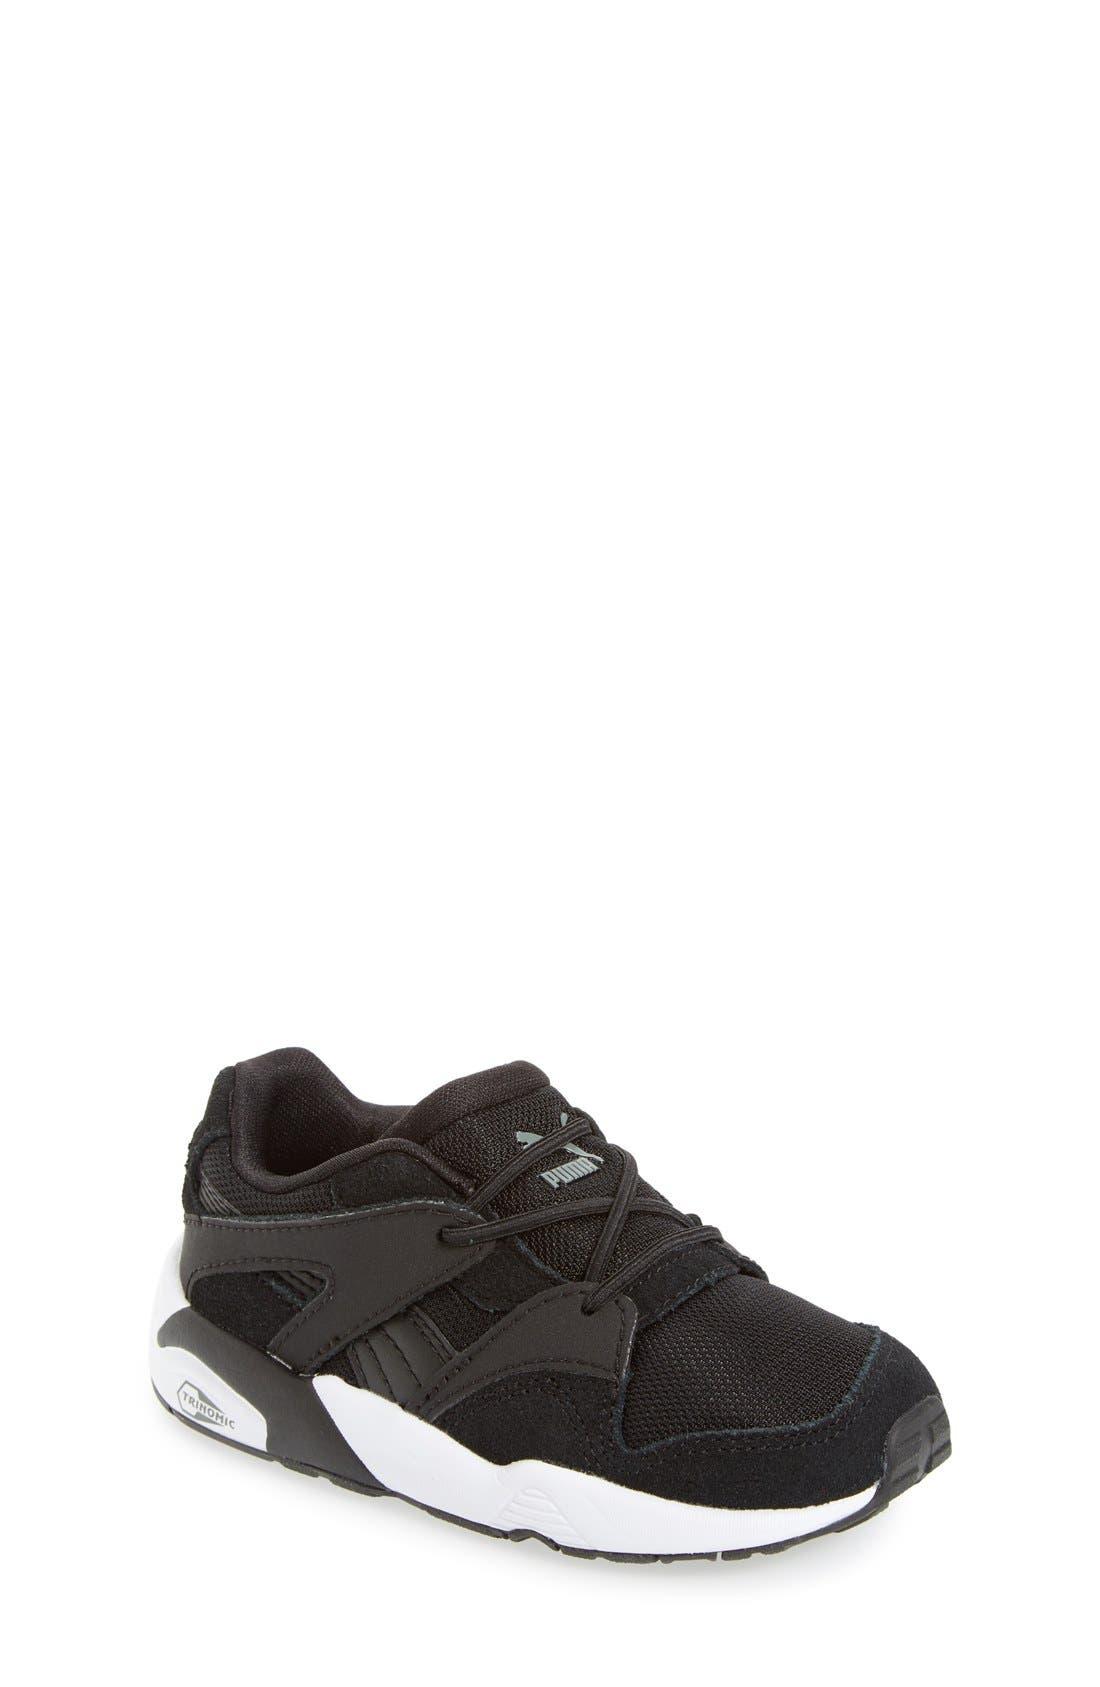 PUMA Blaze INF Slip-On Sneaker (Baby, Walker & Toddler)